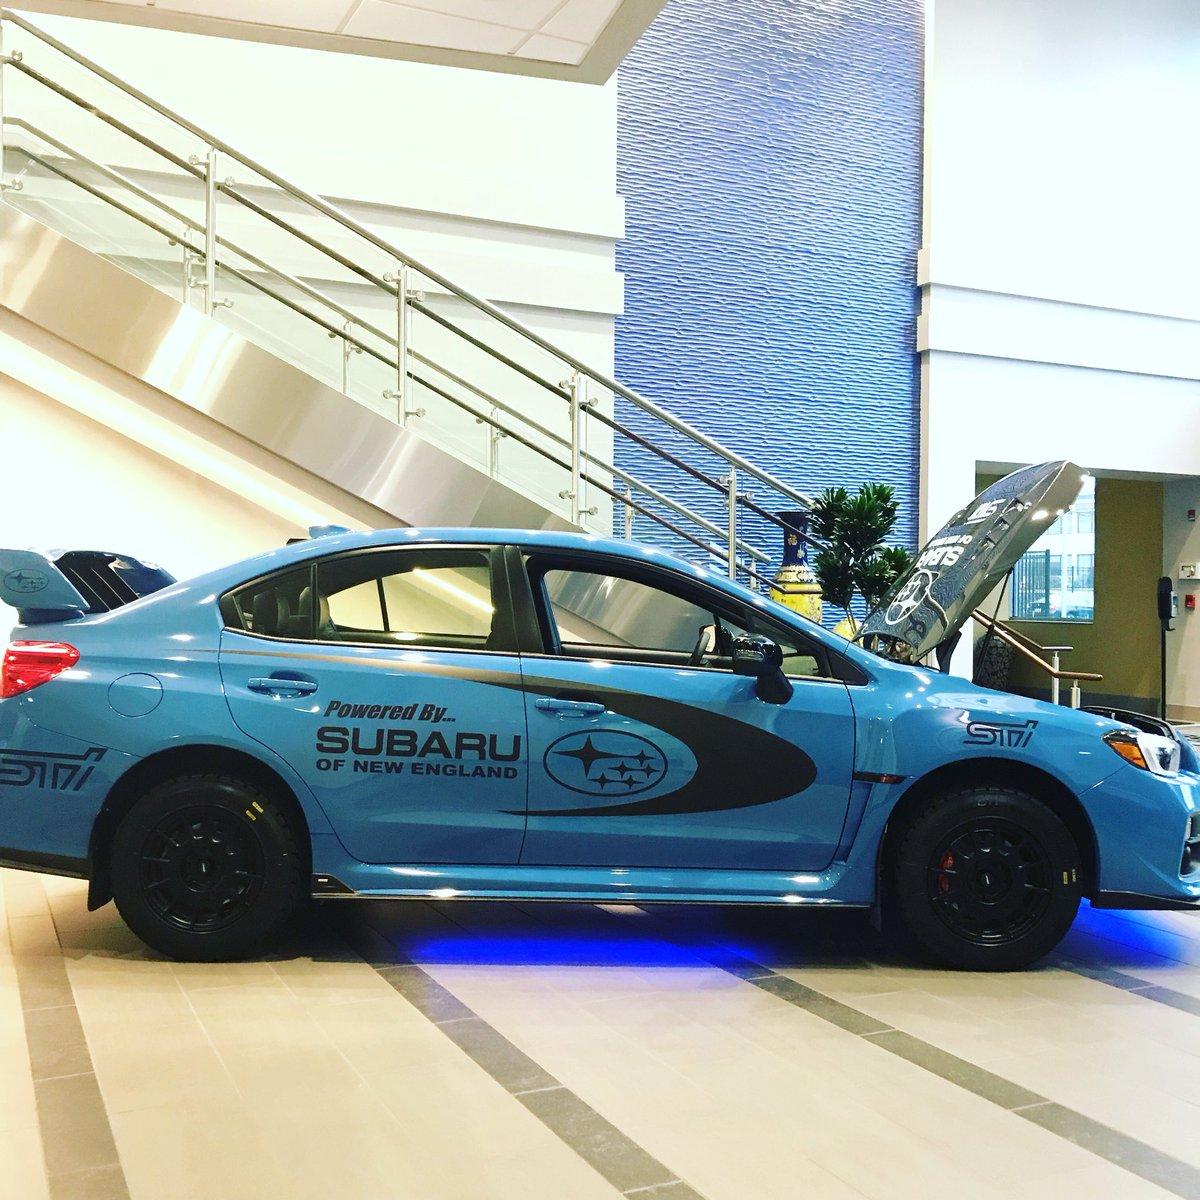 Subaru Of New England >> Subaruofnewengland On Twitter New Lobby Centerpiece Here